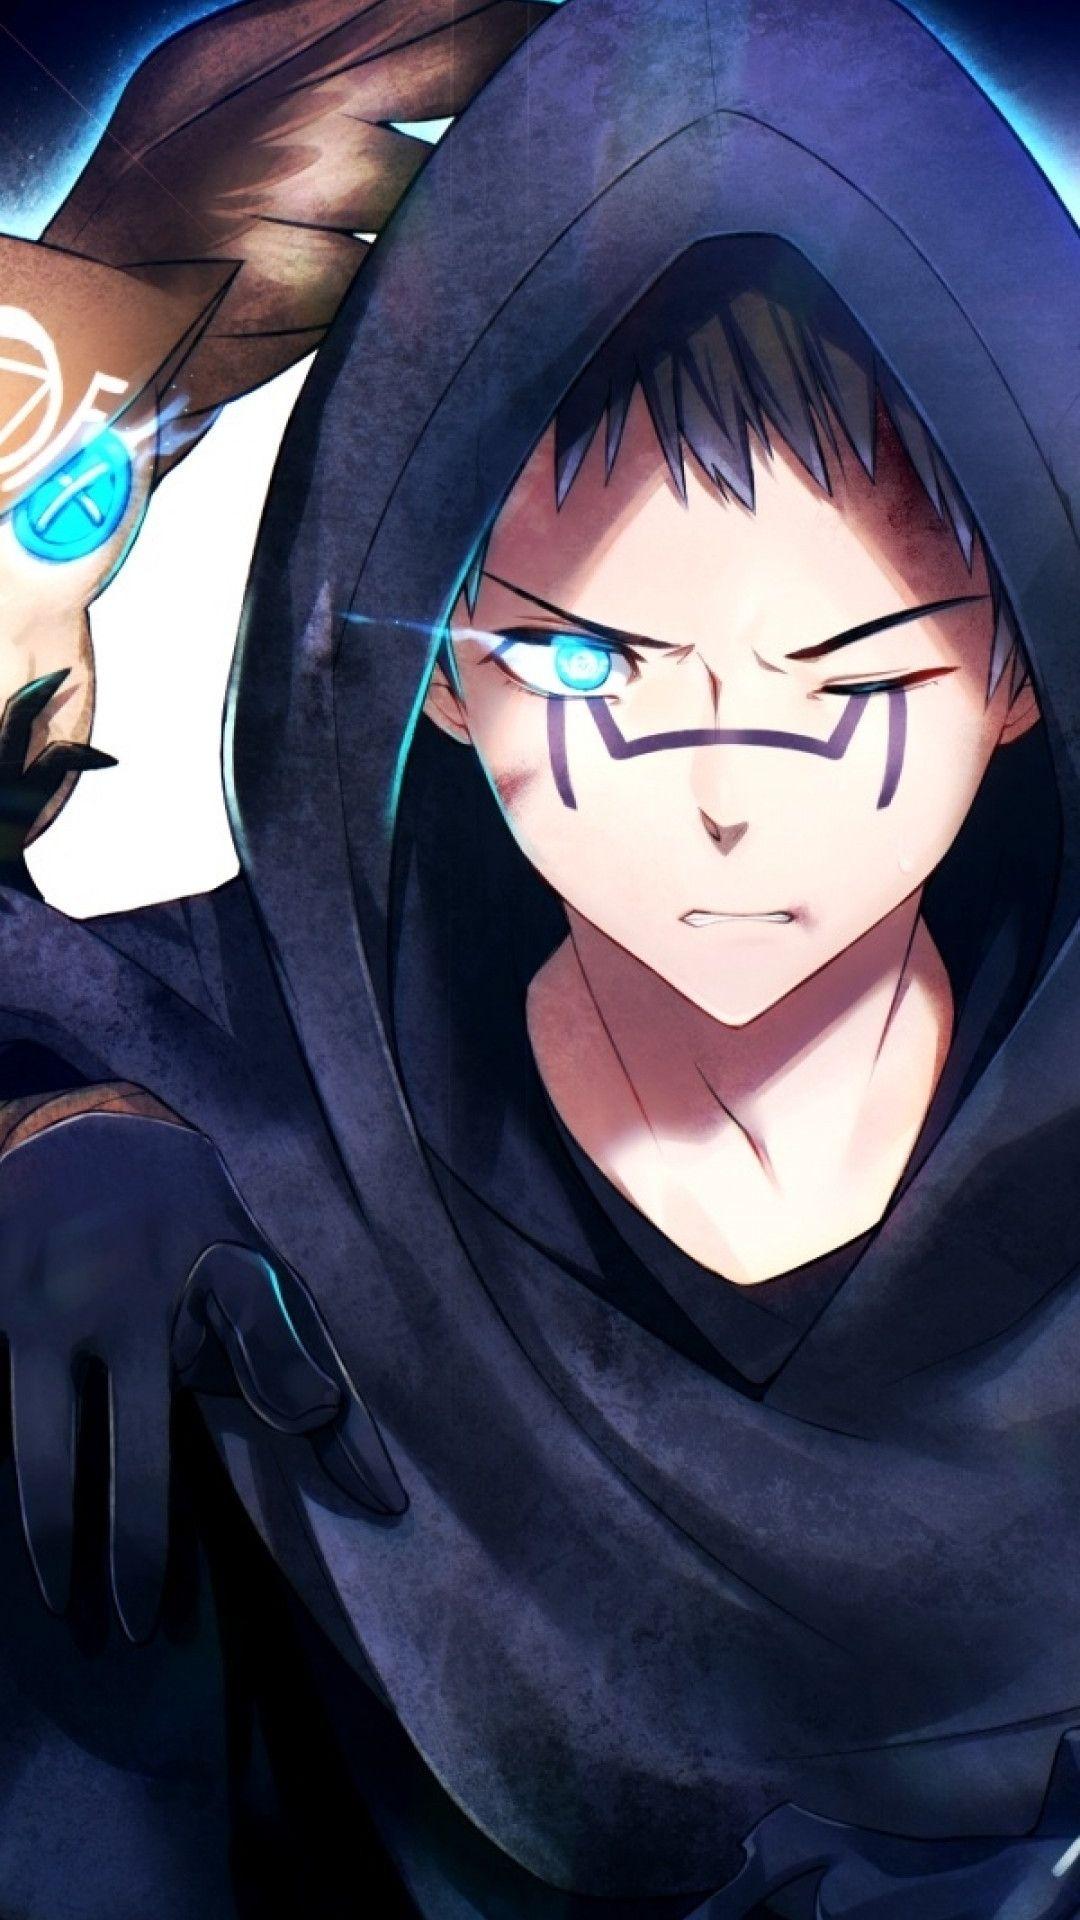 Hoodie Blue Anime Boy : hoodie, anime, Hoodie, Anime, Wallpapers, Wallpaper